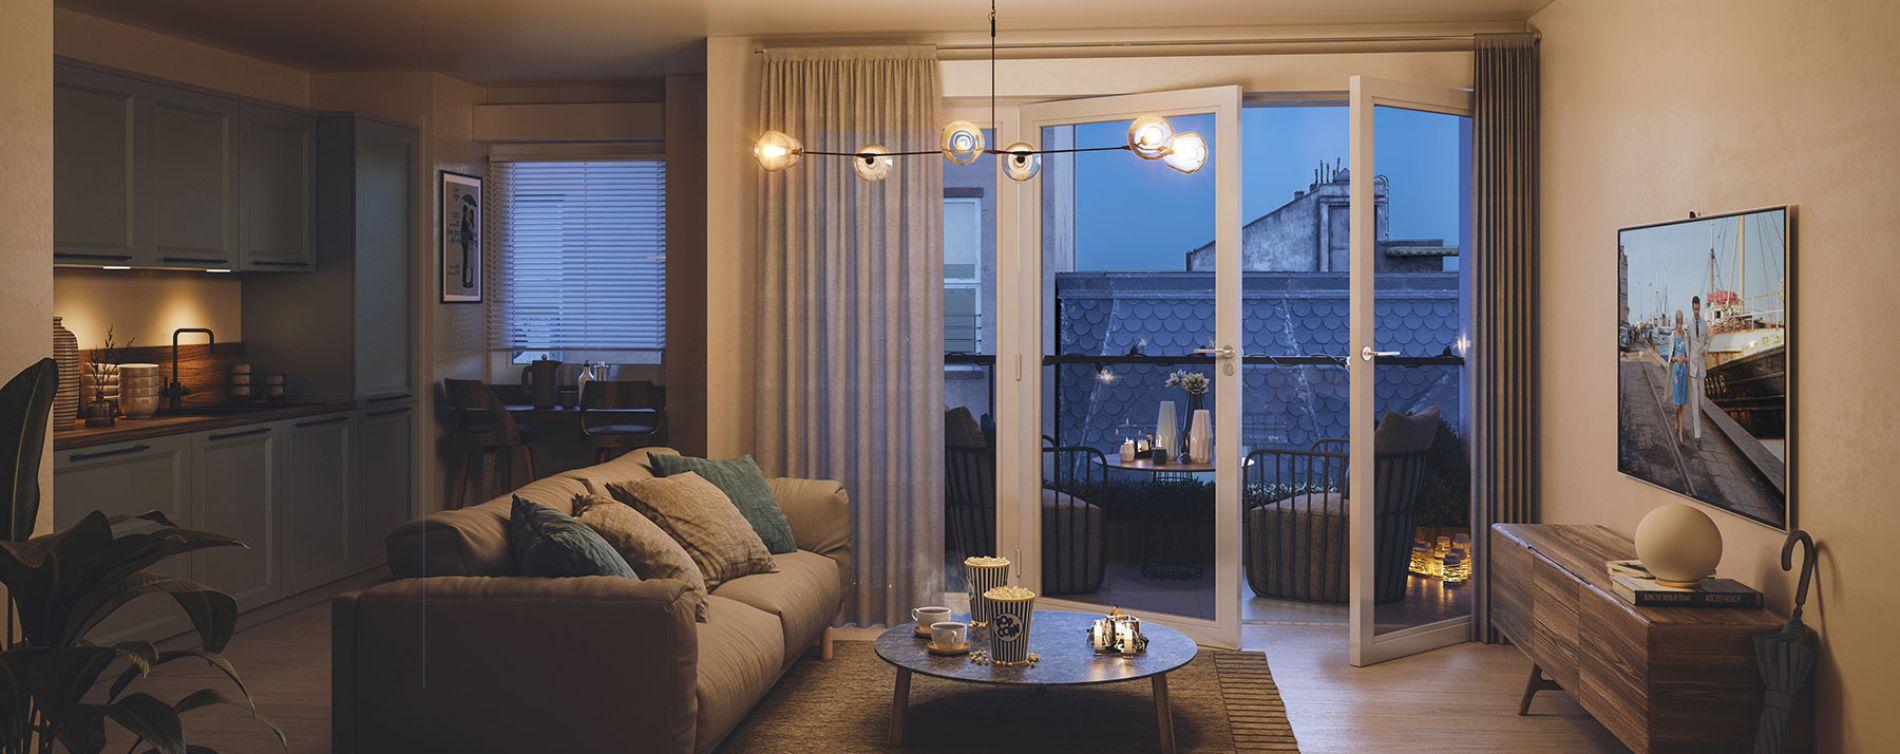 Cherbourg-Octeville : programme immobilier neuve « Passage Emery » (2)